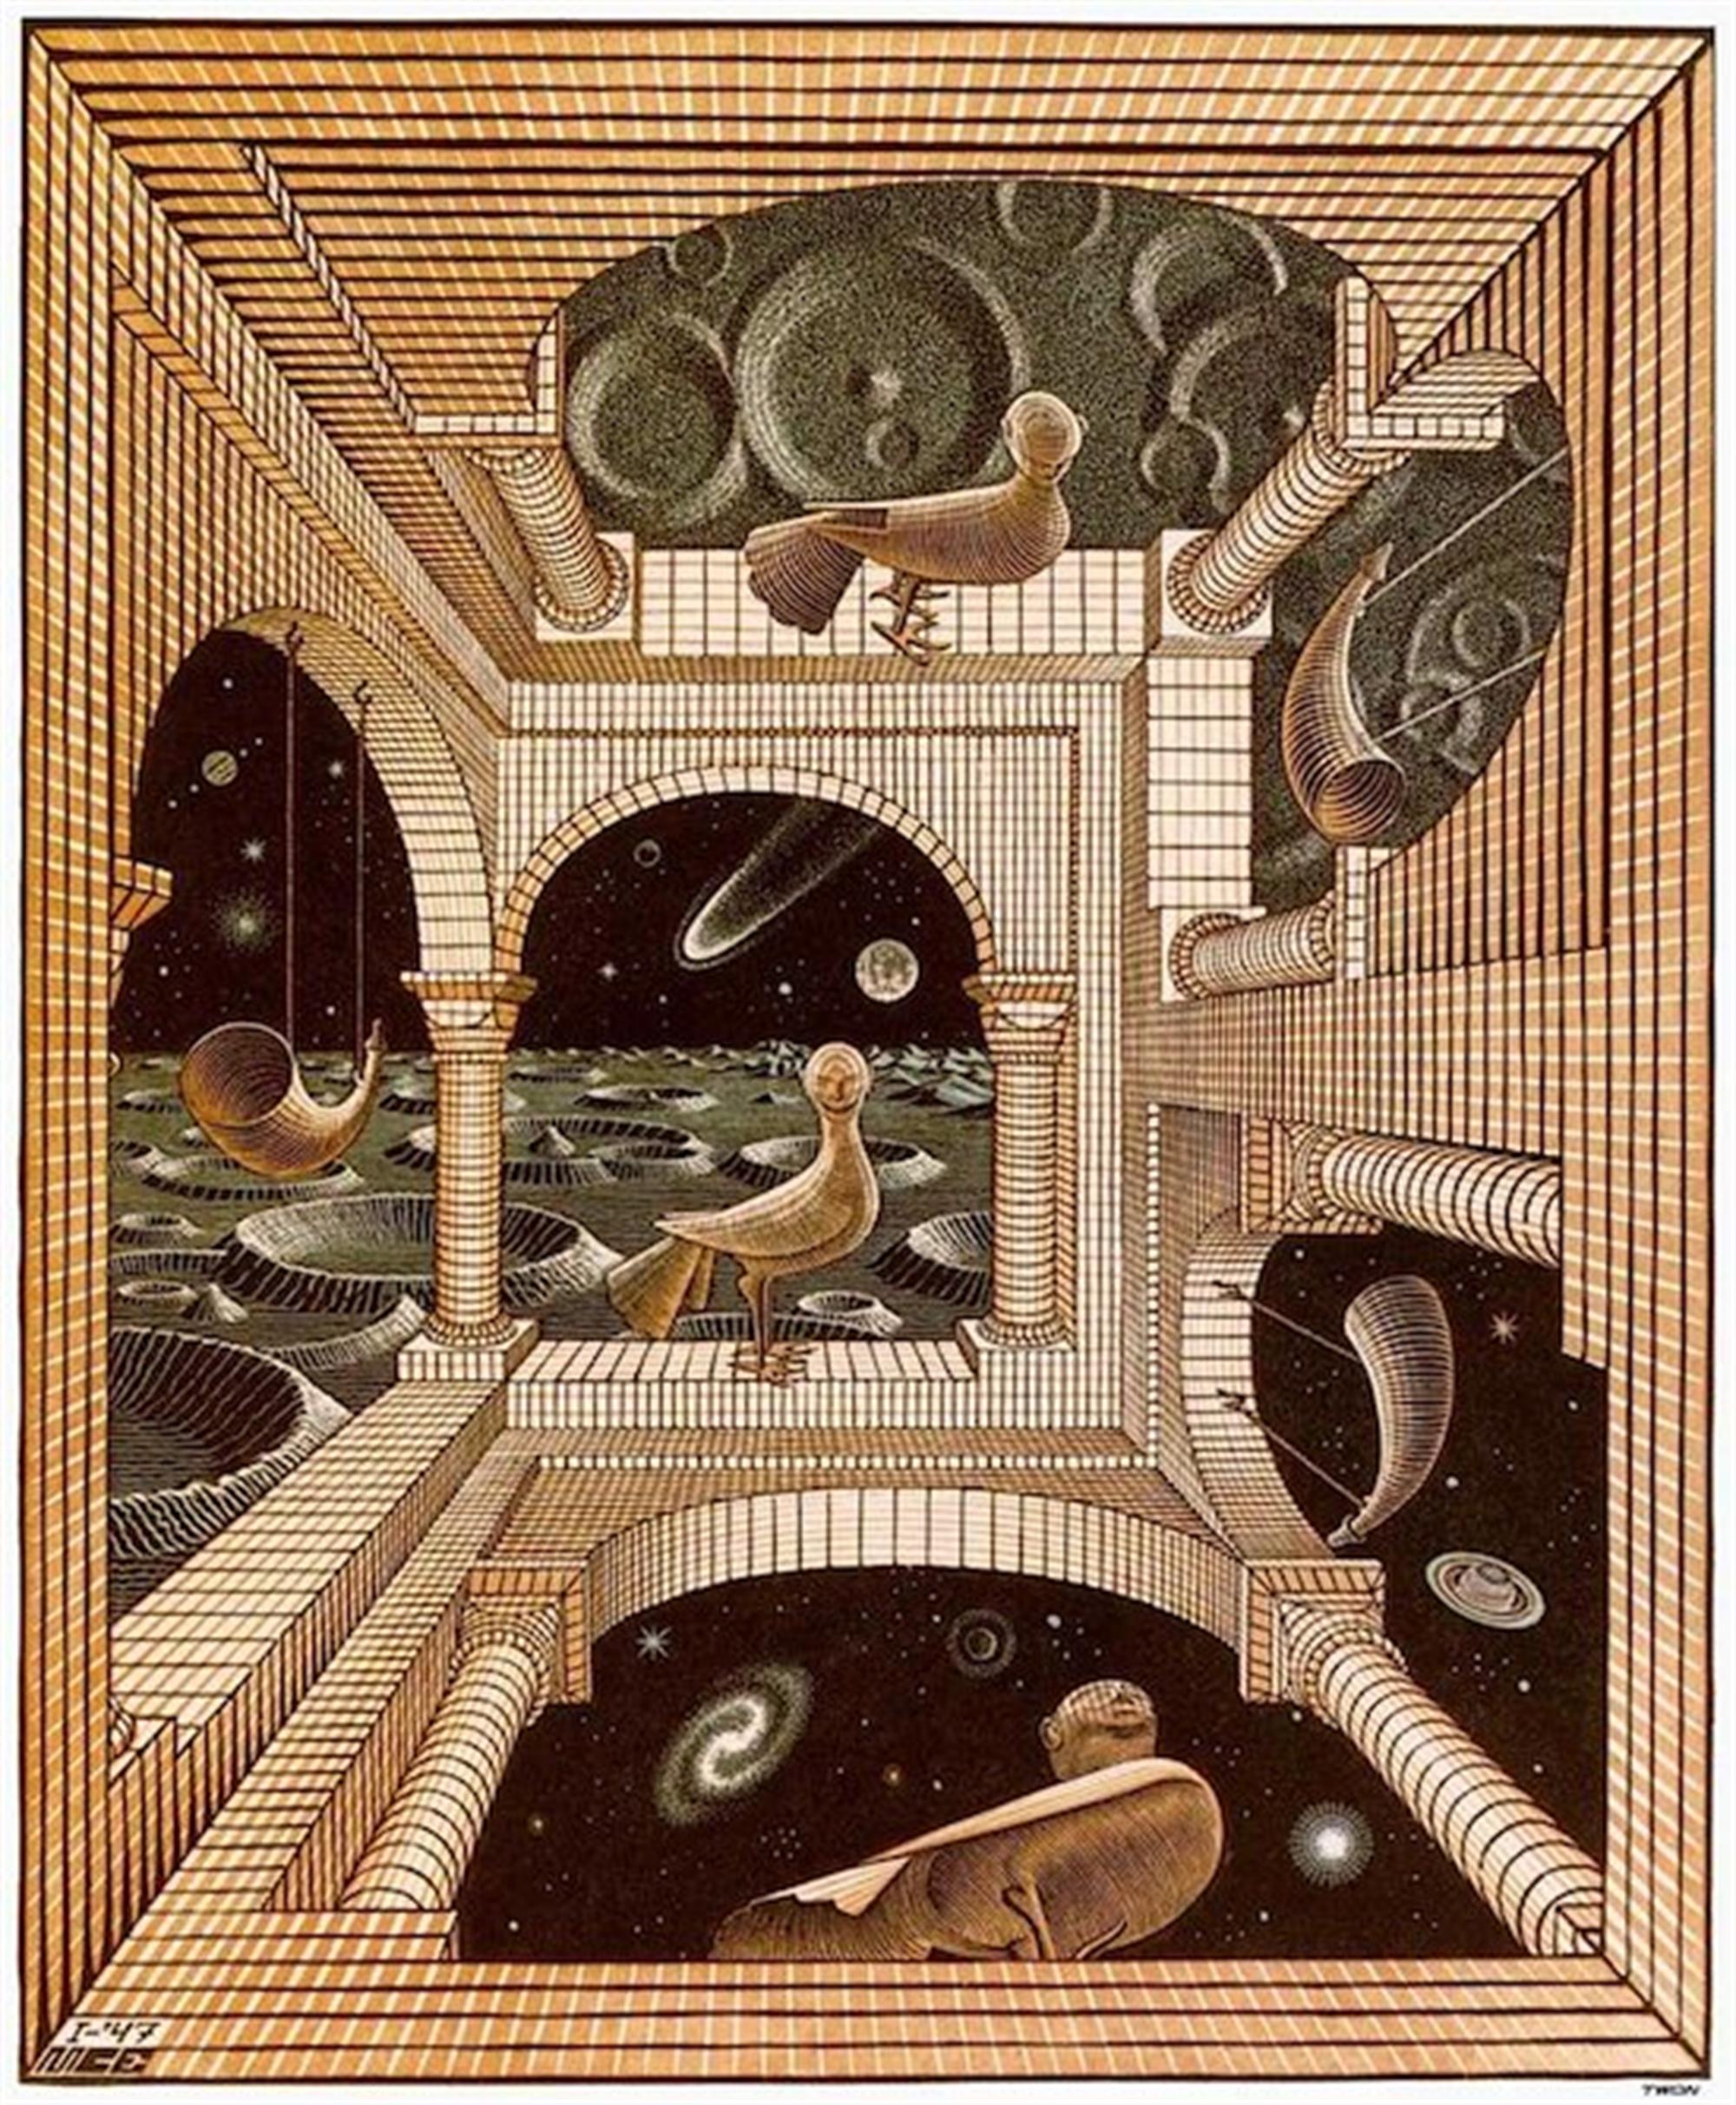 Other World (Another World) by M.C. Escher